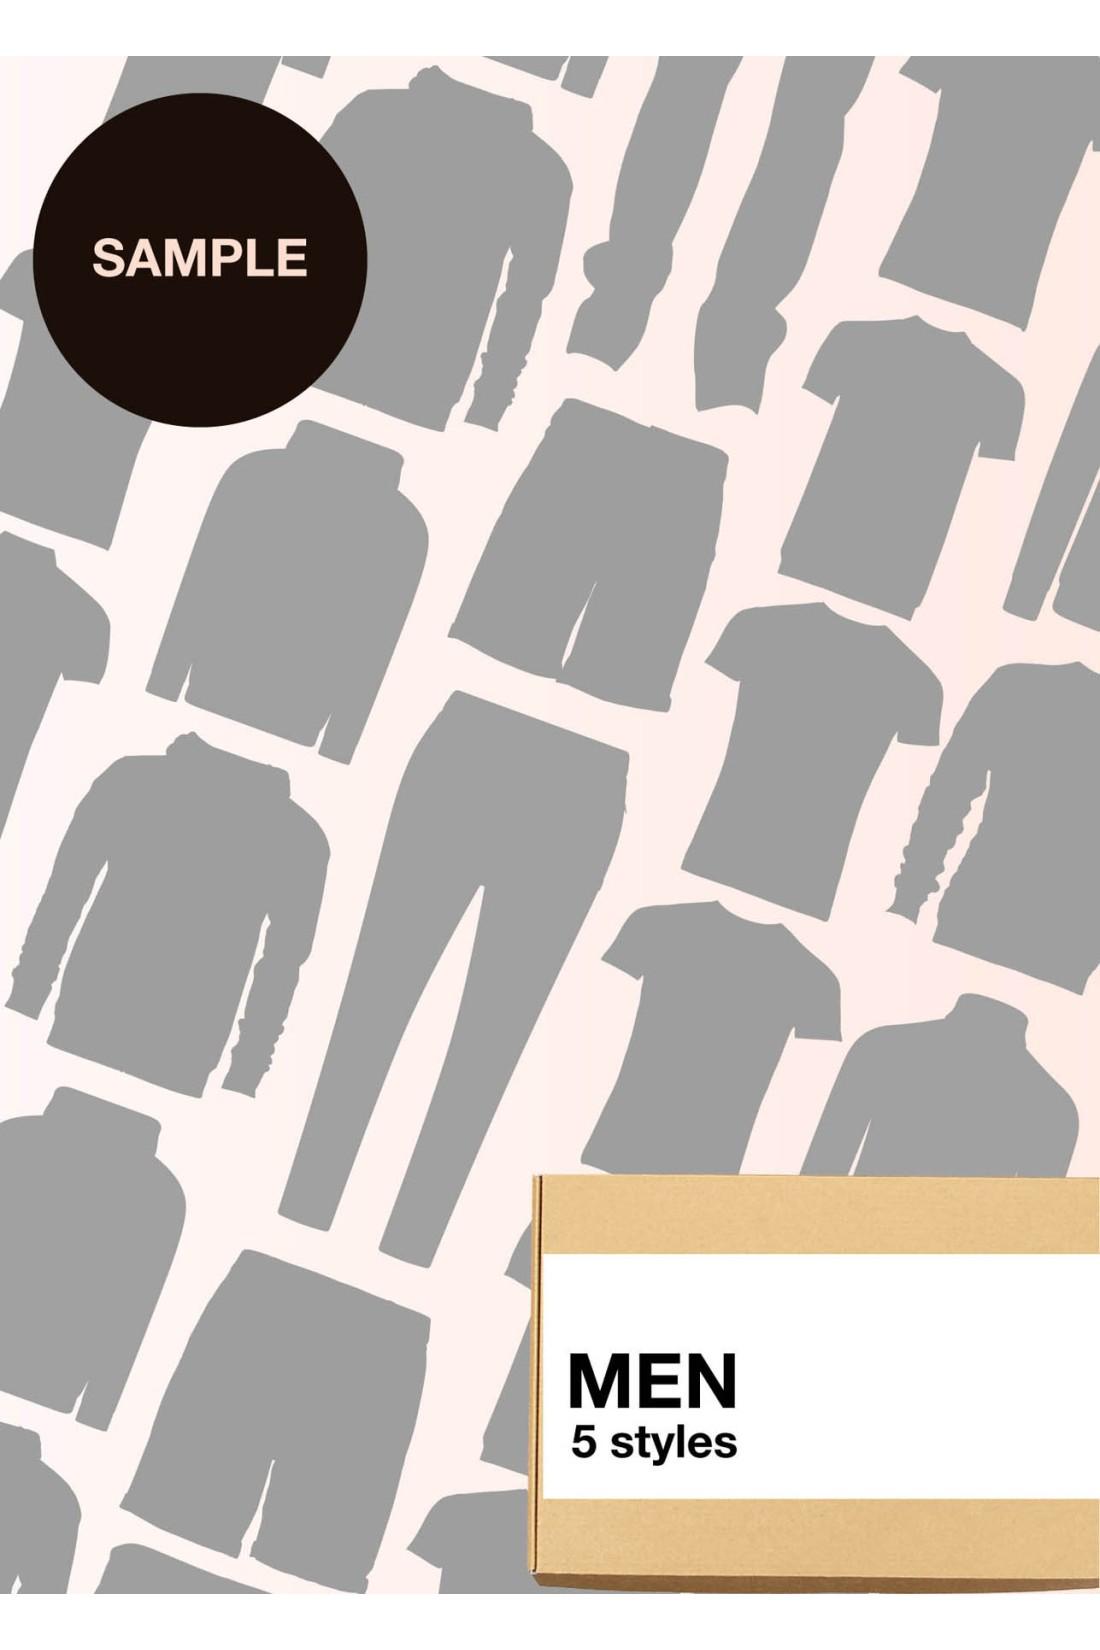 Sample Surprise Box Men - 5 Styles